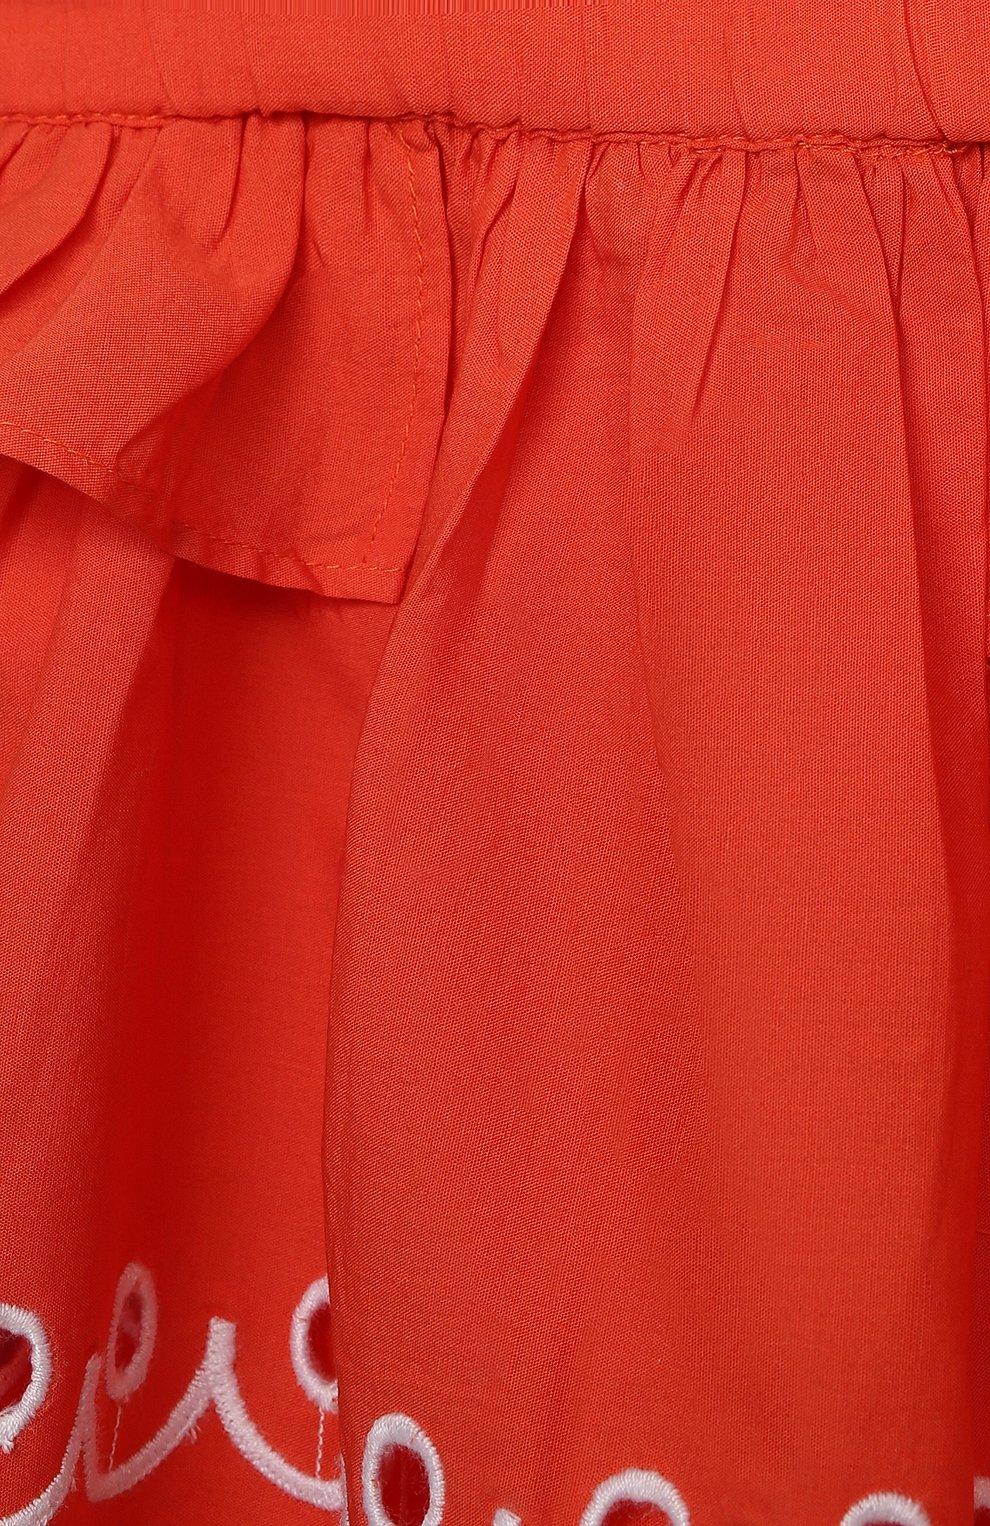 Детский комплект из топа и шорт STELLA MCCARTNEY кораллового цвета, арт. 602544/SQK79/9M | Фото 6